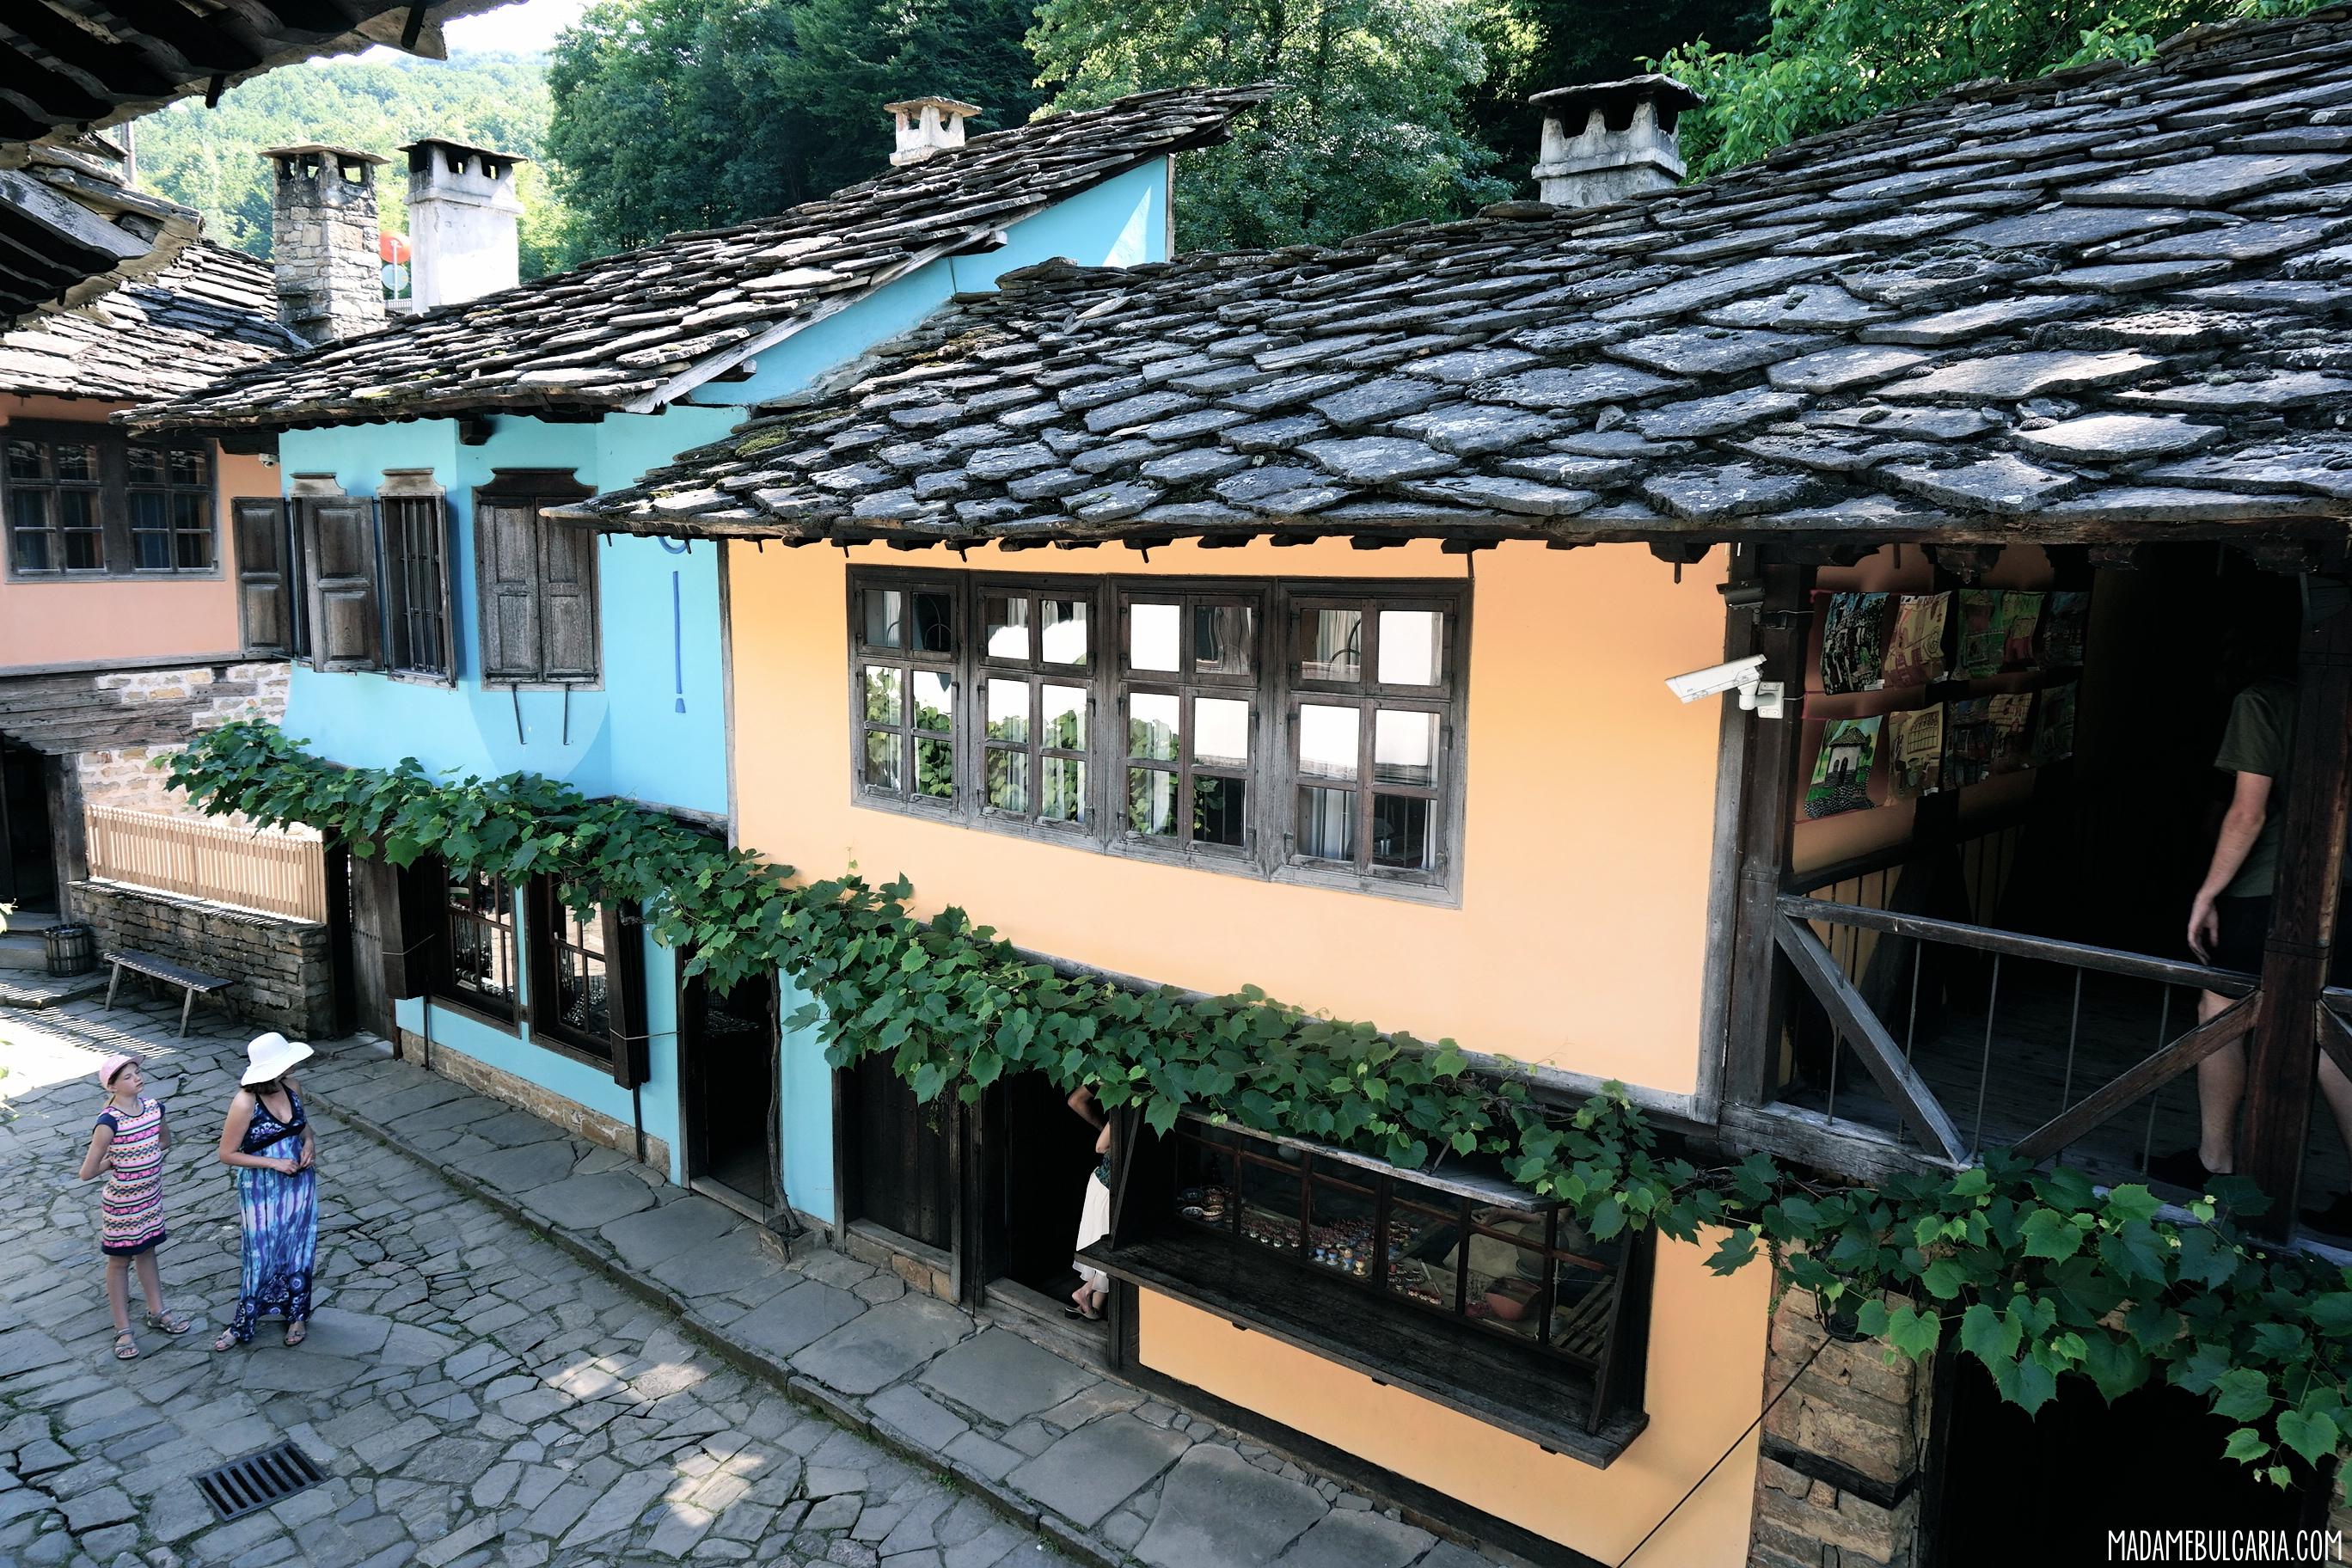 Architectural ethnographic complex Etar Gabrovo Bulgaria